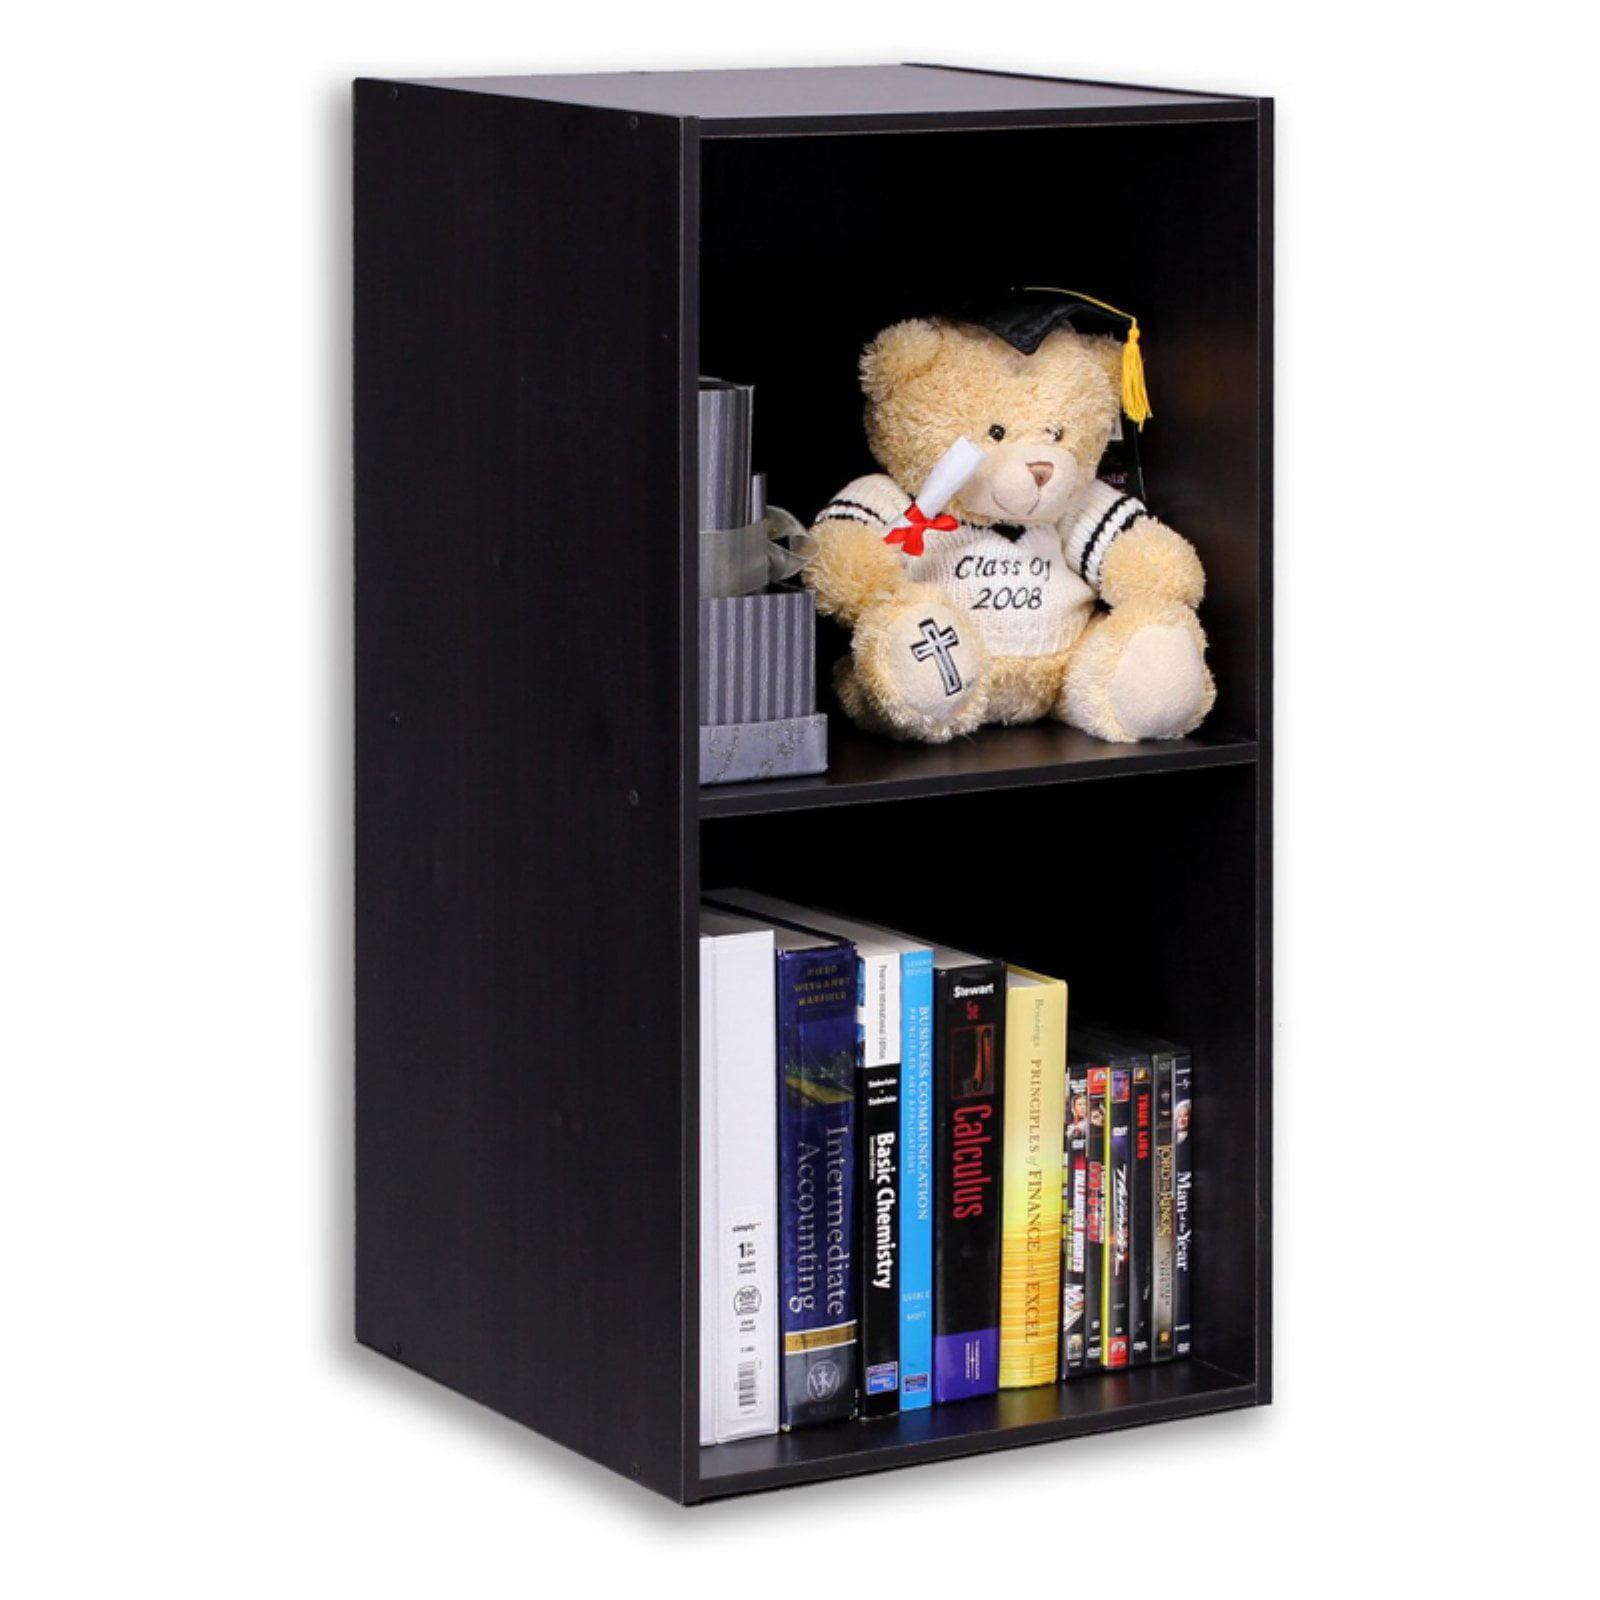 Furinno 11013EX Hidup Tropika Eco Modular Open Cube Tall Storage with Shelf, Espresso